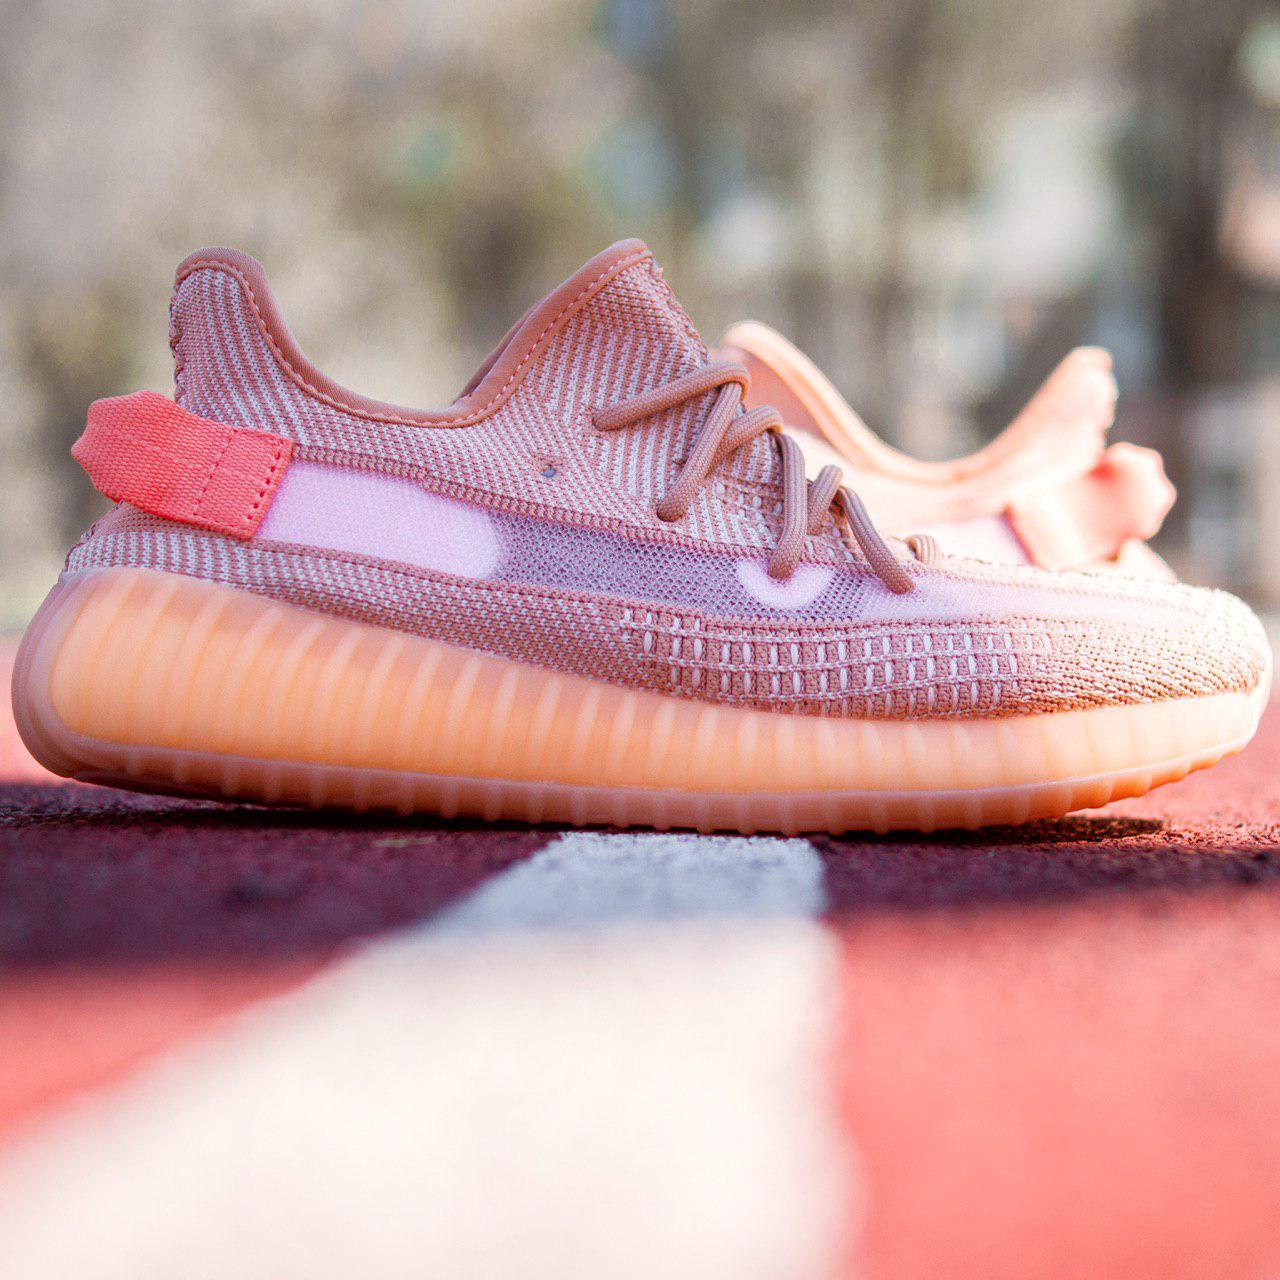 aec1fee9 Мужские кроссовки Adidas Yeezy Boost 350 V2 White (Адидас изи бутс  оранжевые) - OnWhite